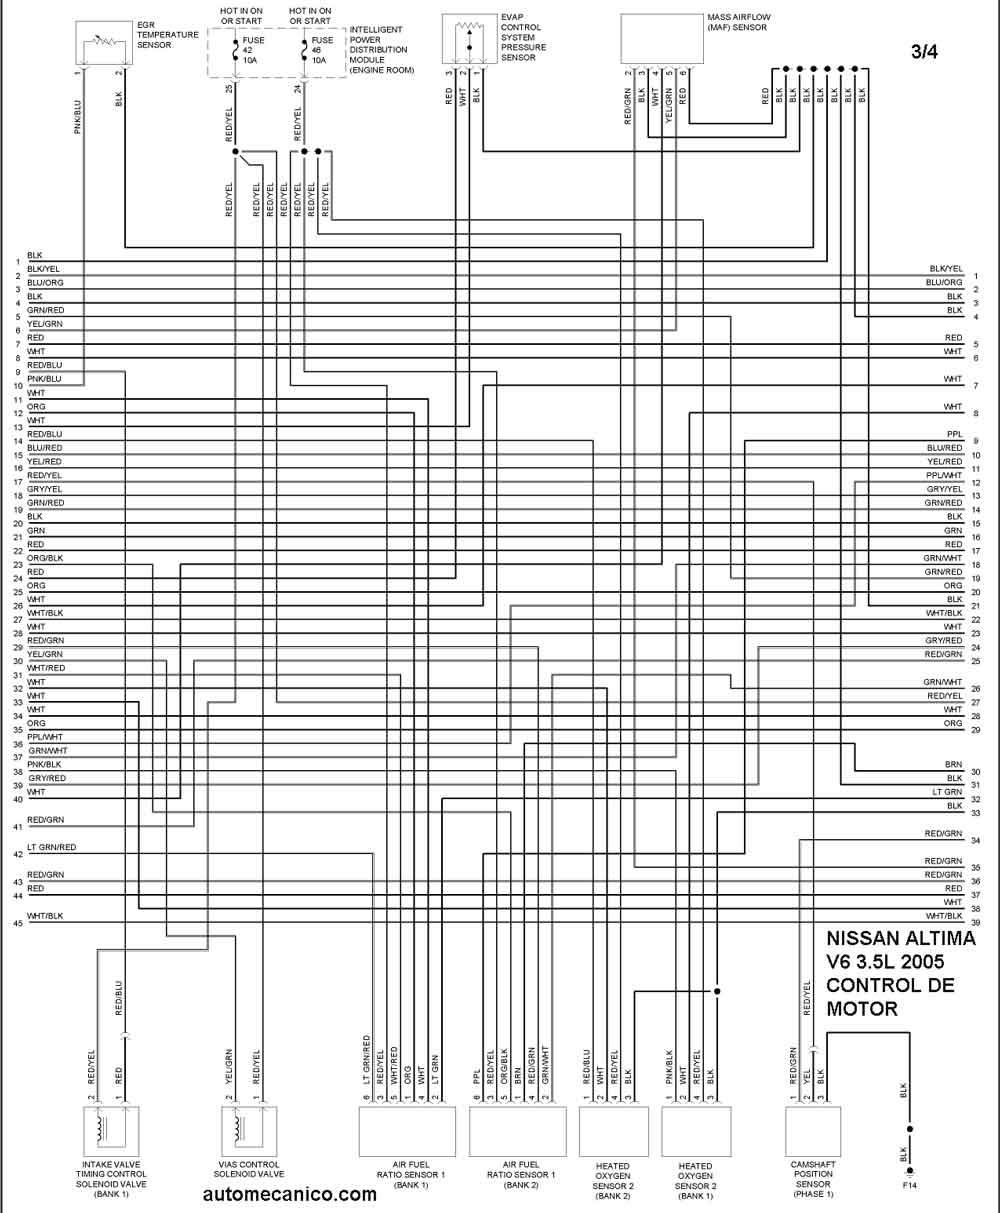 RepairGuideContent also Nissan Preguntas Que Incluyen Diagrama De Nissan Altima 97 as well 1991 Nissan D21 pickup Wiring diagram together with 1988 Nissan D21 pickup Wiring diagram in addition RepairGuideContent. on nissan d21 lighting diagram